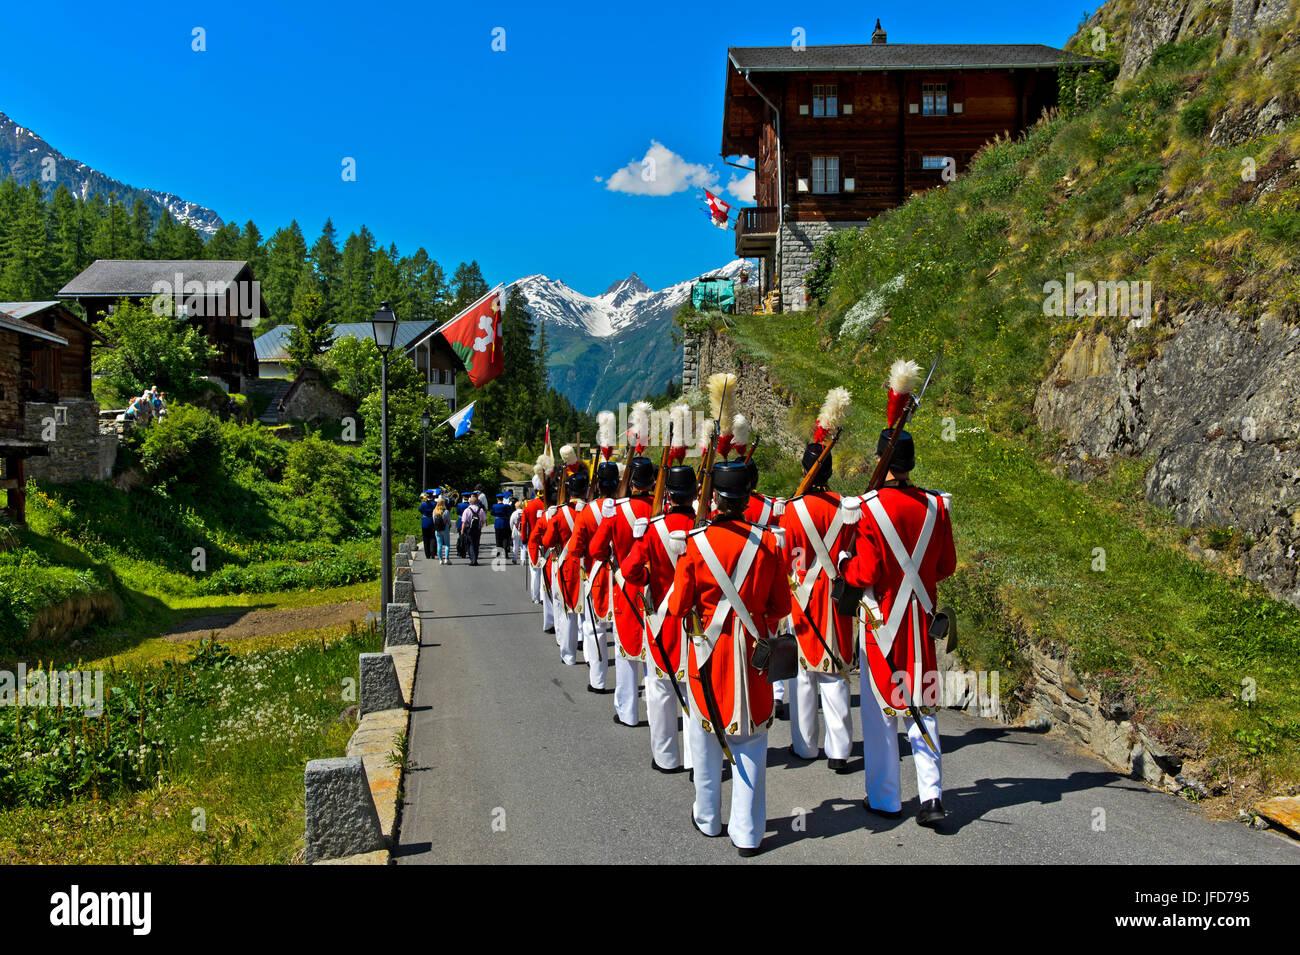 Herrgottsgrenadiere at the Corpus Christi procession, Blatten, Lötschental, Valais, Switzerland - Stock Image